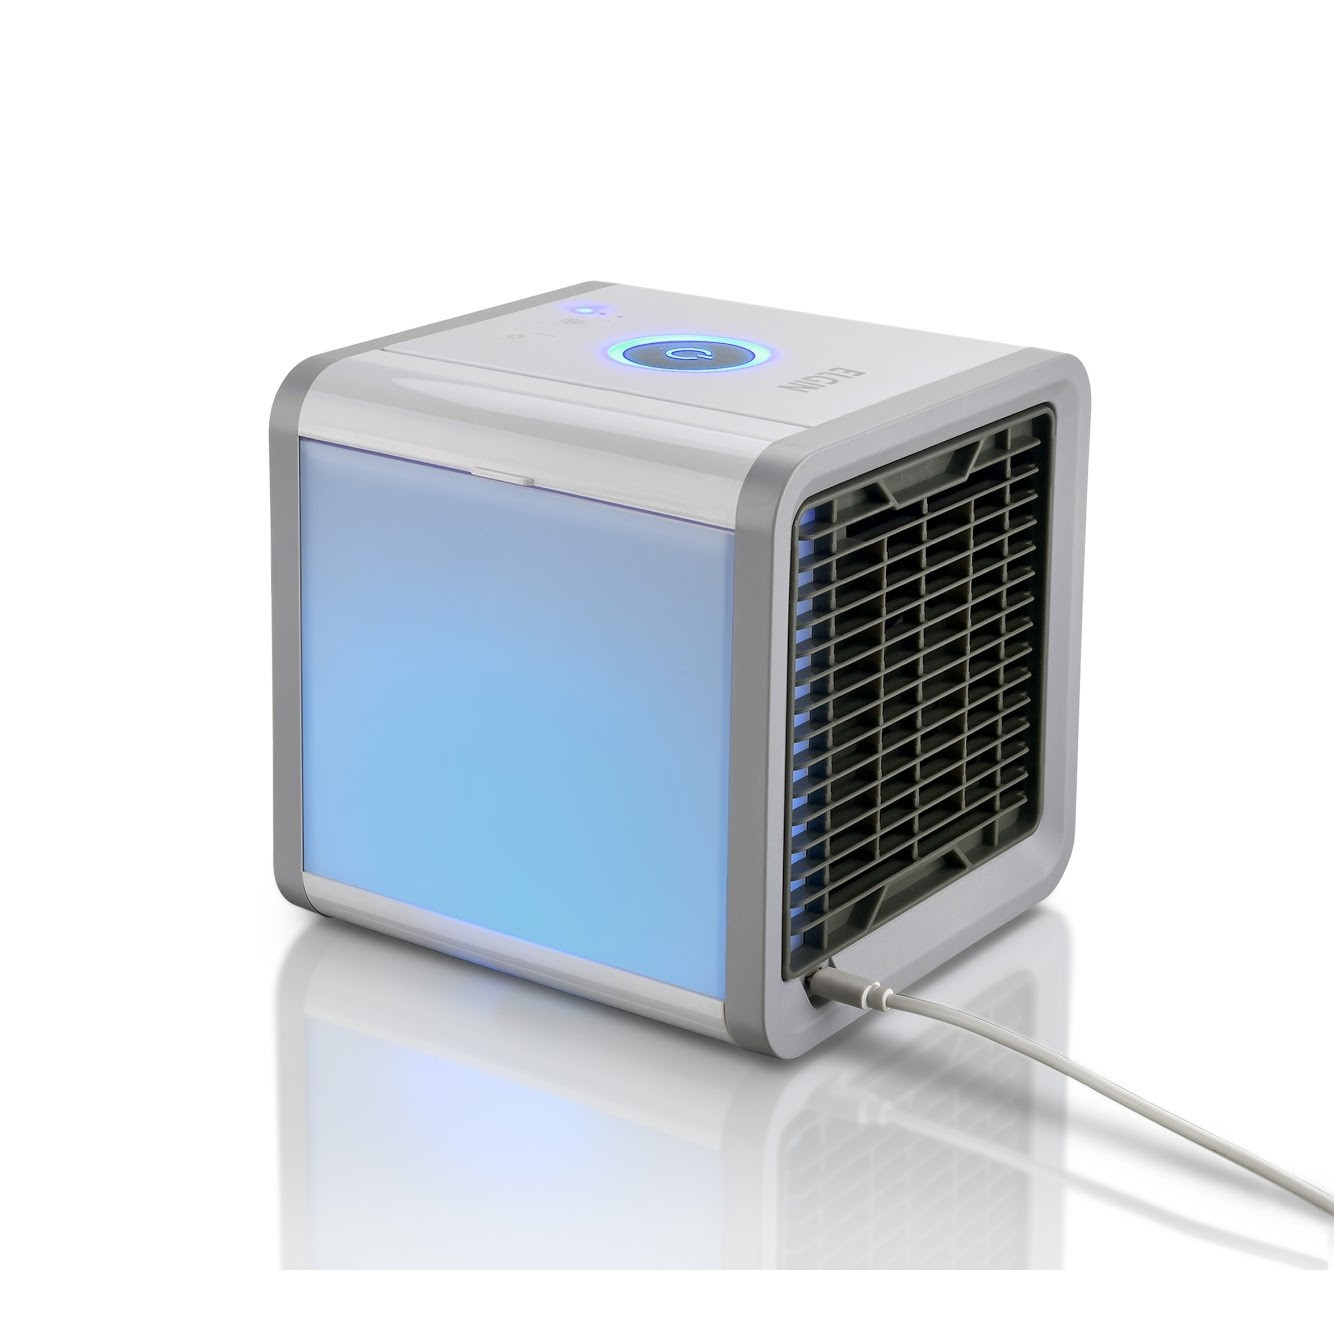 Climatizador de Ar Magic Air 8w 3 Velocidades 5V - FGFN01N5NA - Elgin